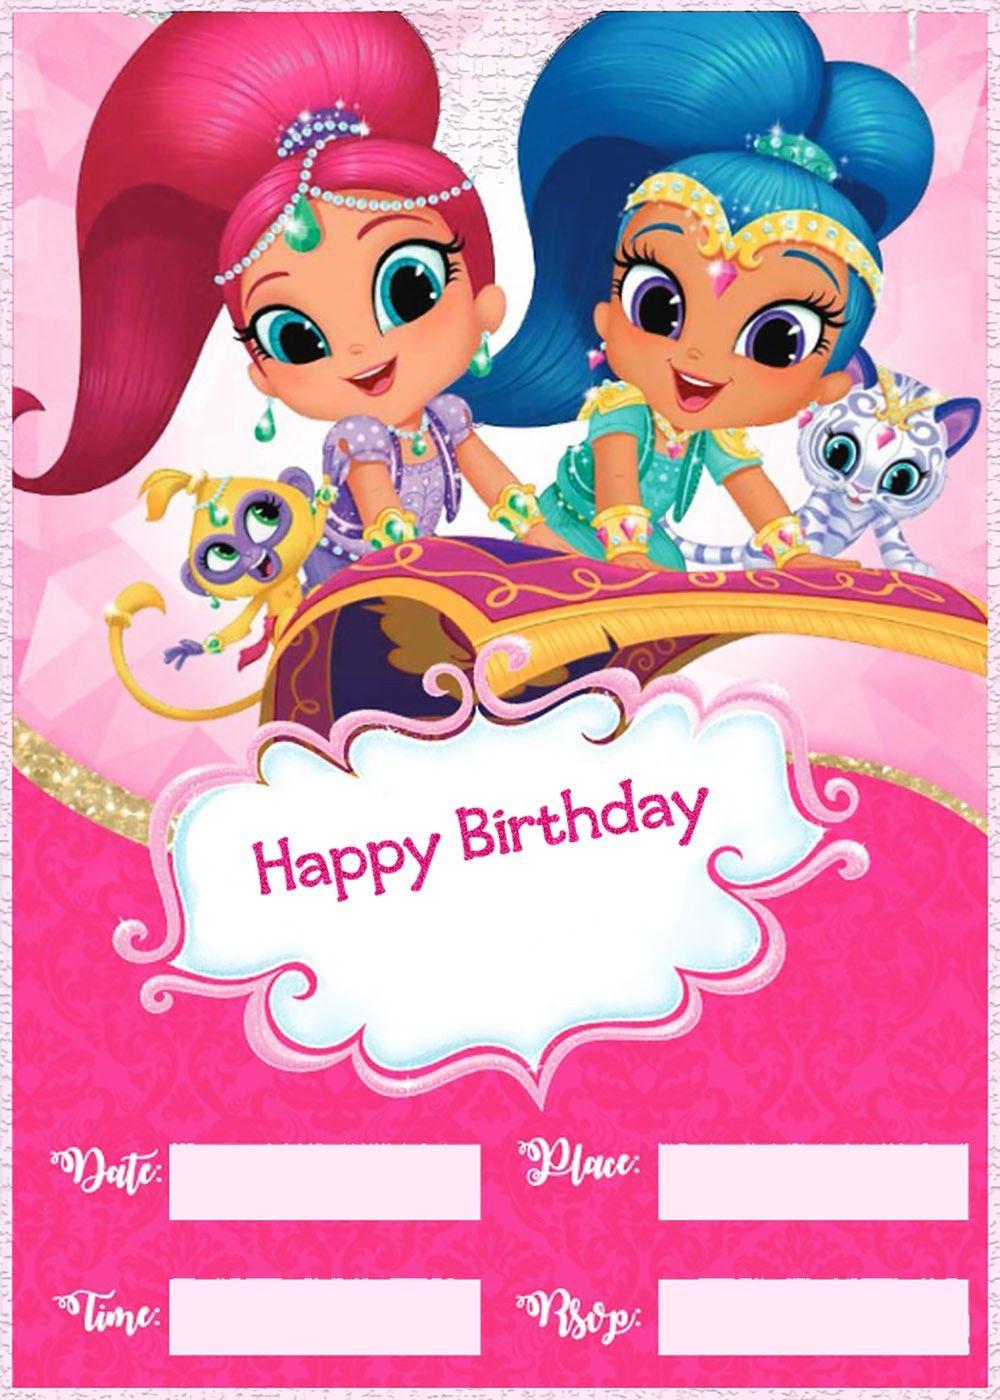 Shimmer And Shine Birthday Party Invitation Template Birthday Party Invitation Templates Party Invite Template Girl Birthday Party Invitations